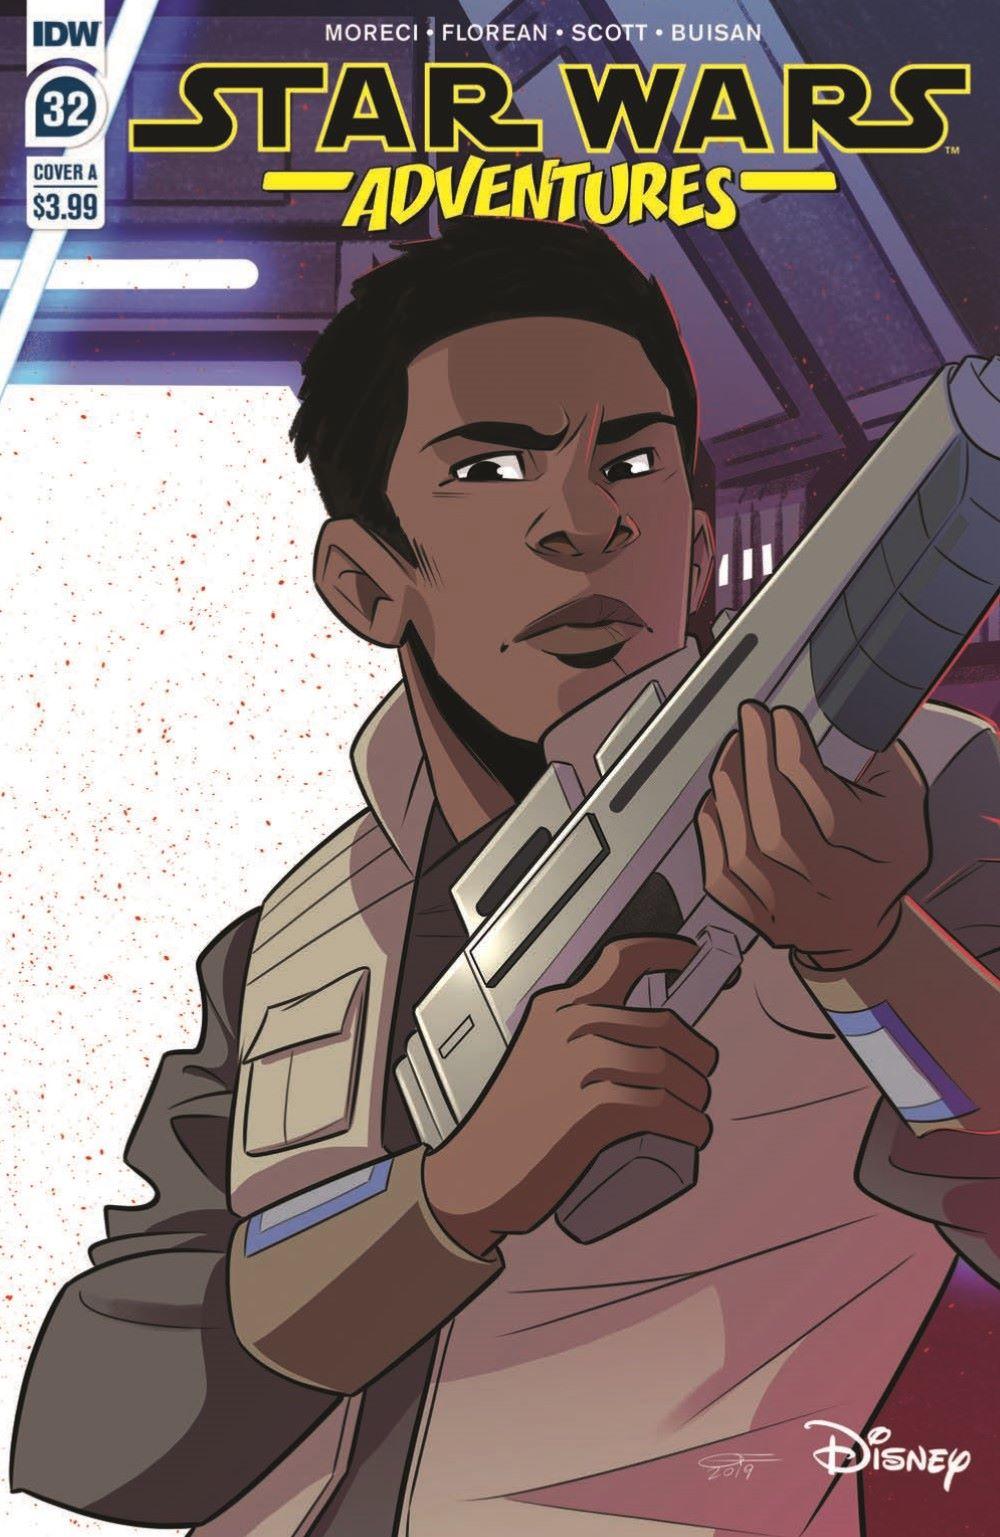 StarWarsAdv32-pr-1-1 ComicList Previews: STAR WARS ADVENTURES #32